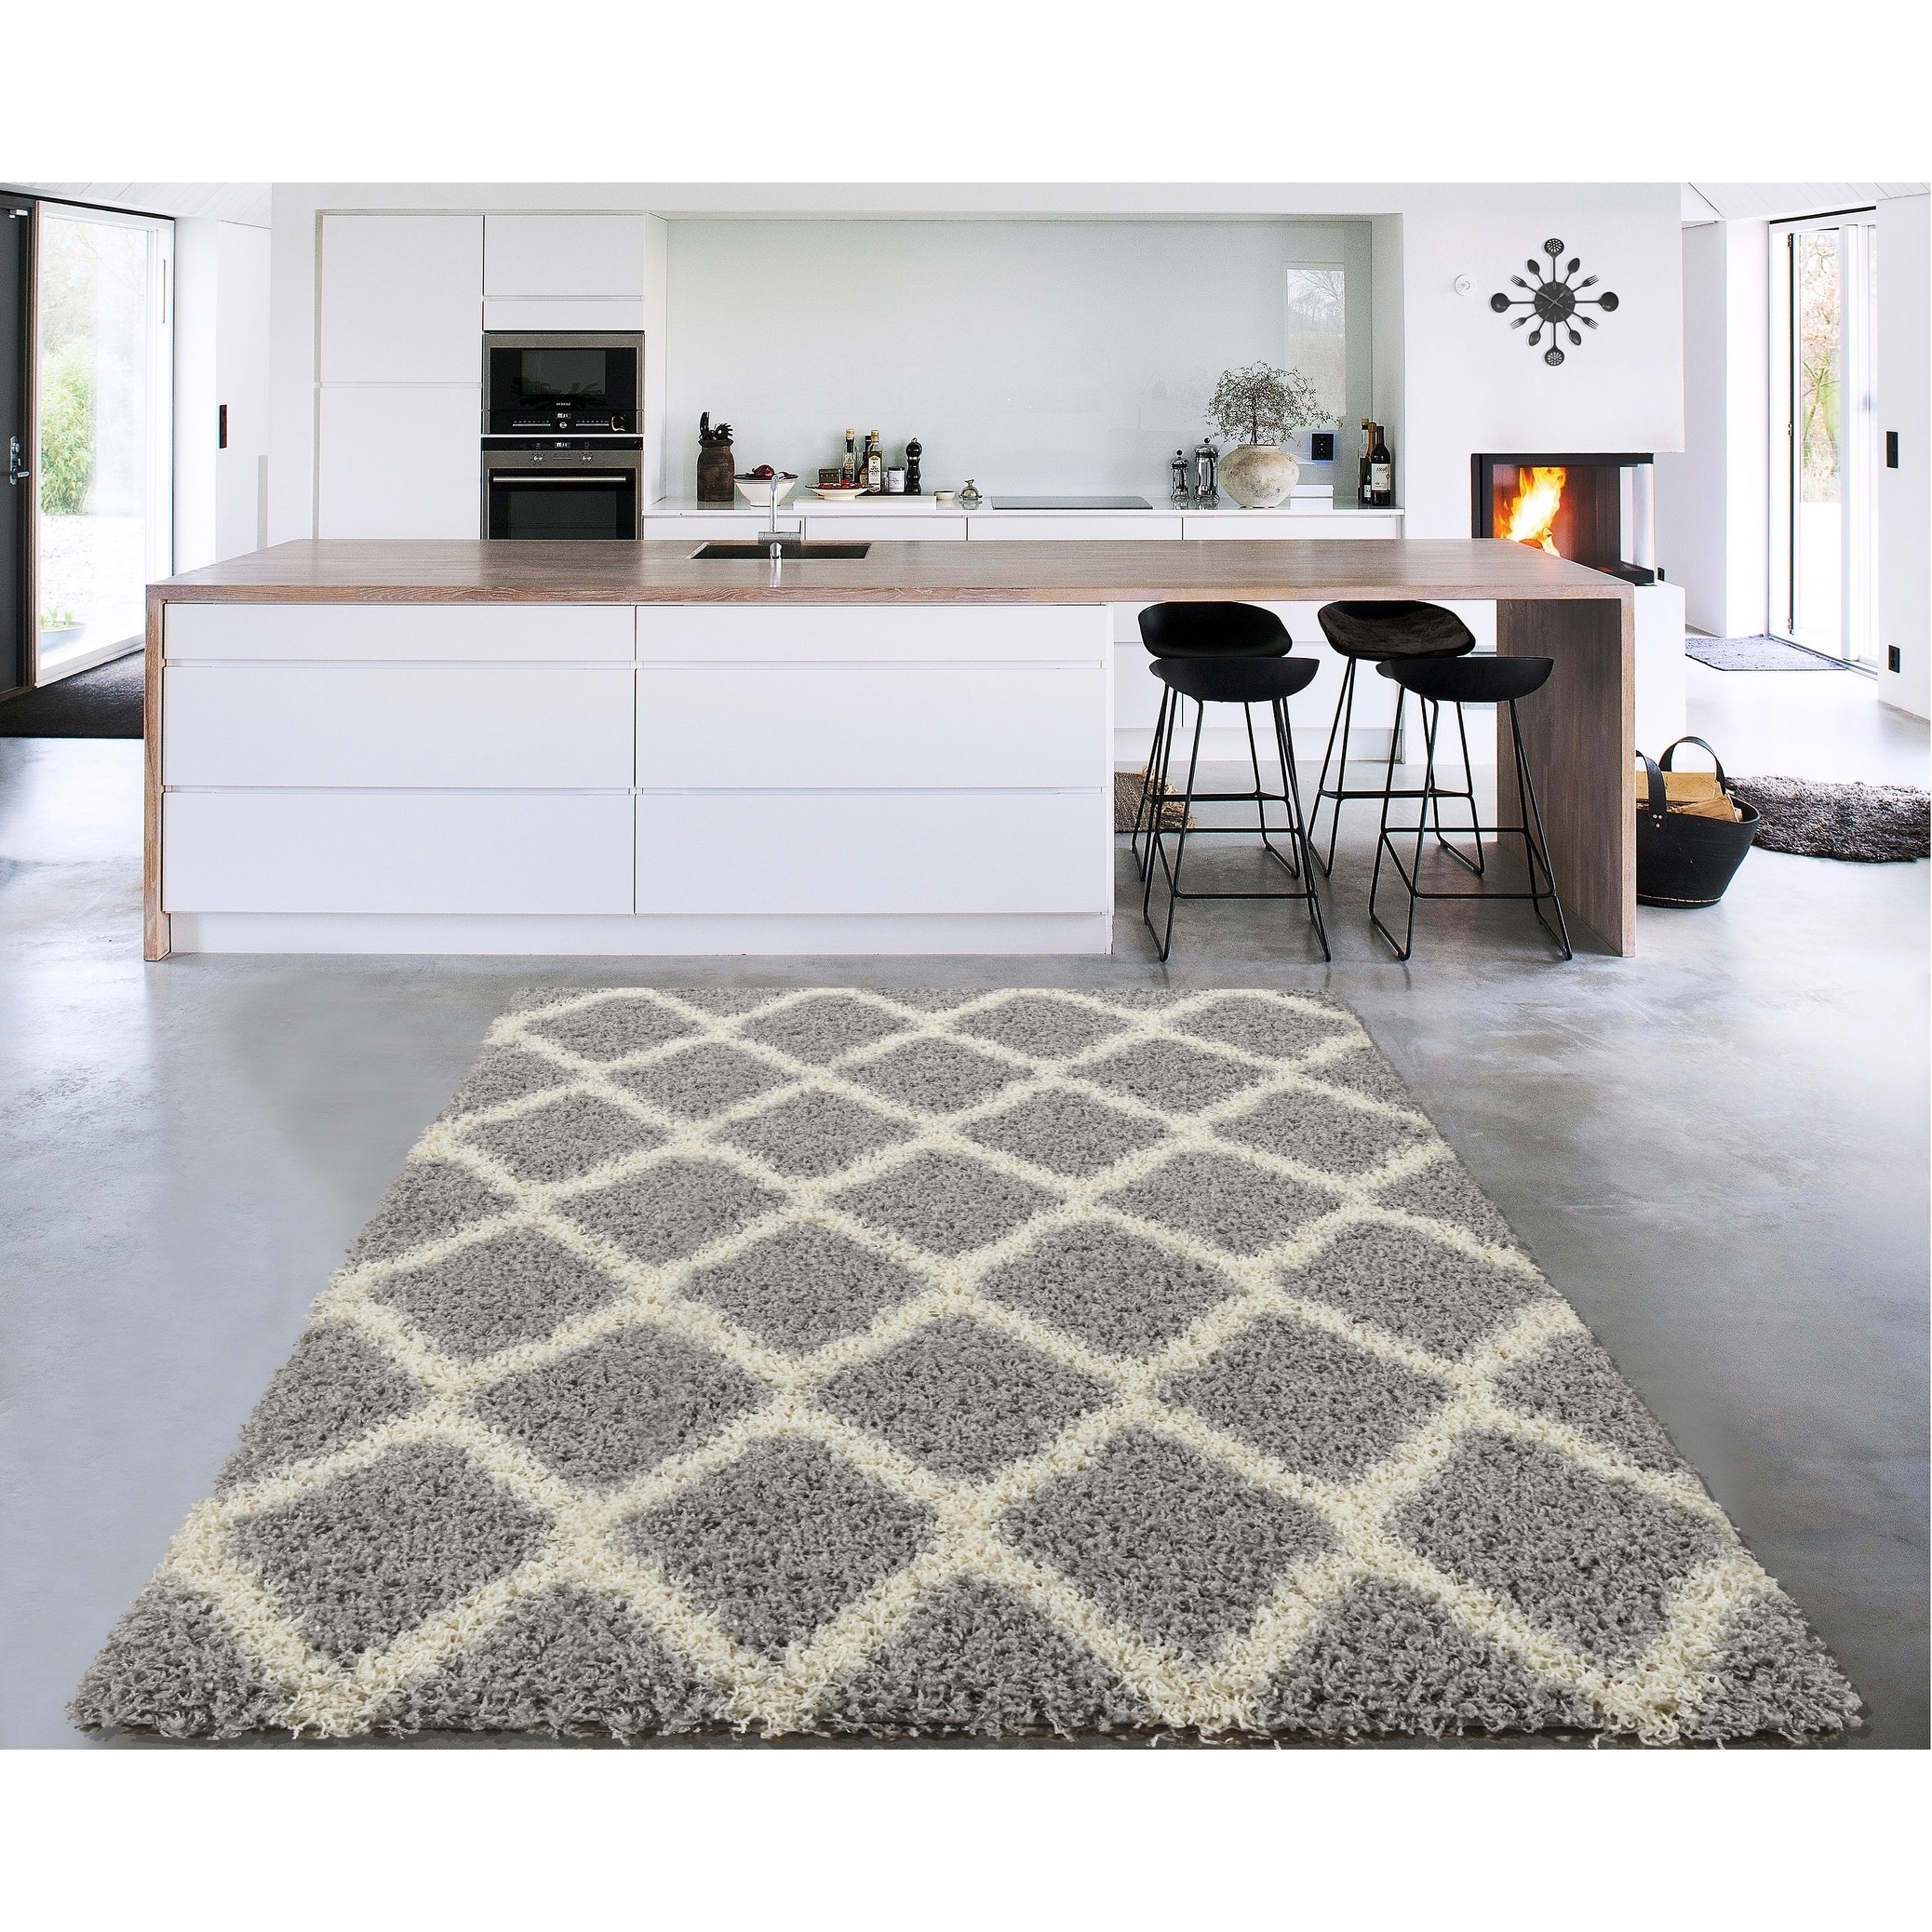 Sweet Home Stores Cozy Shag Trellis Design Shag Rug (3' x...